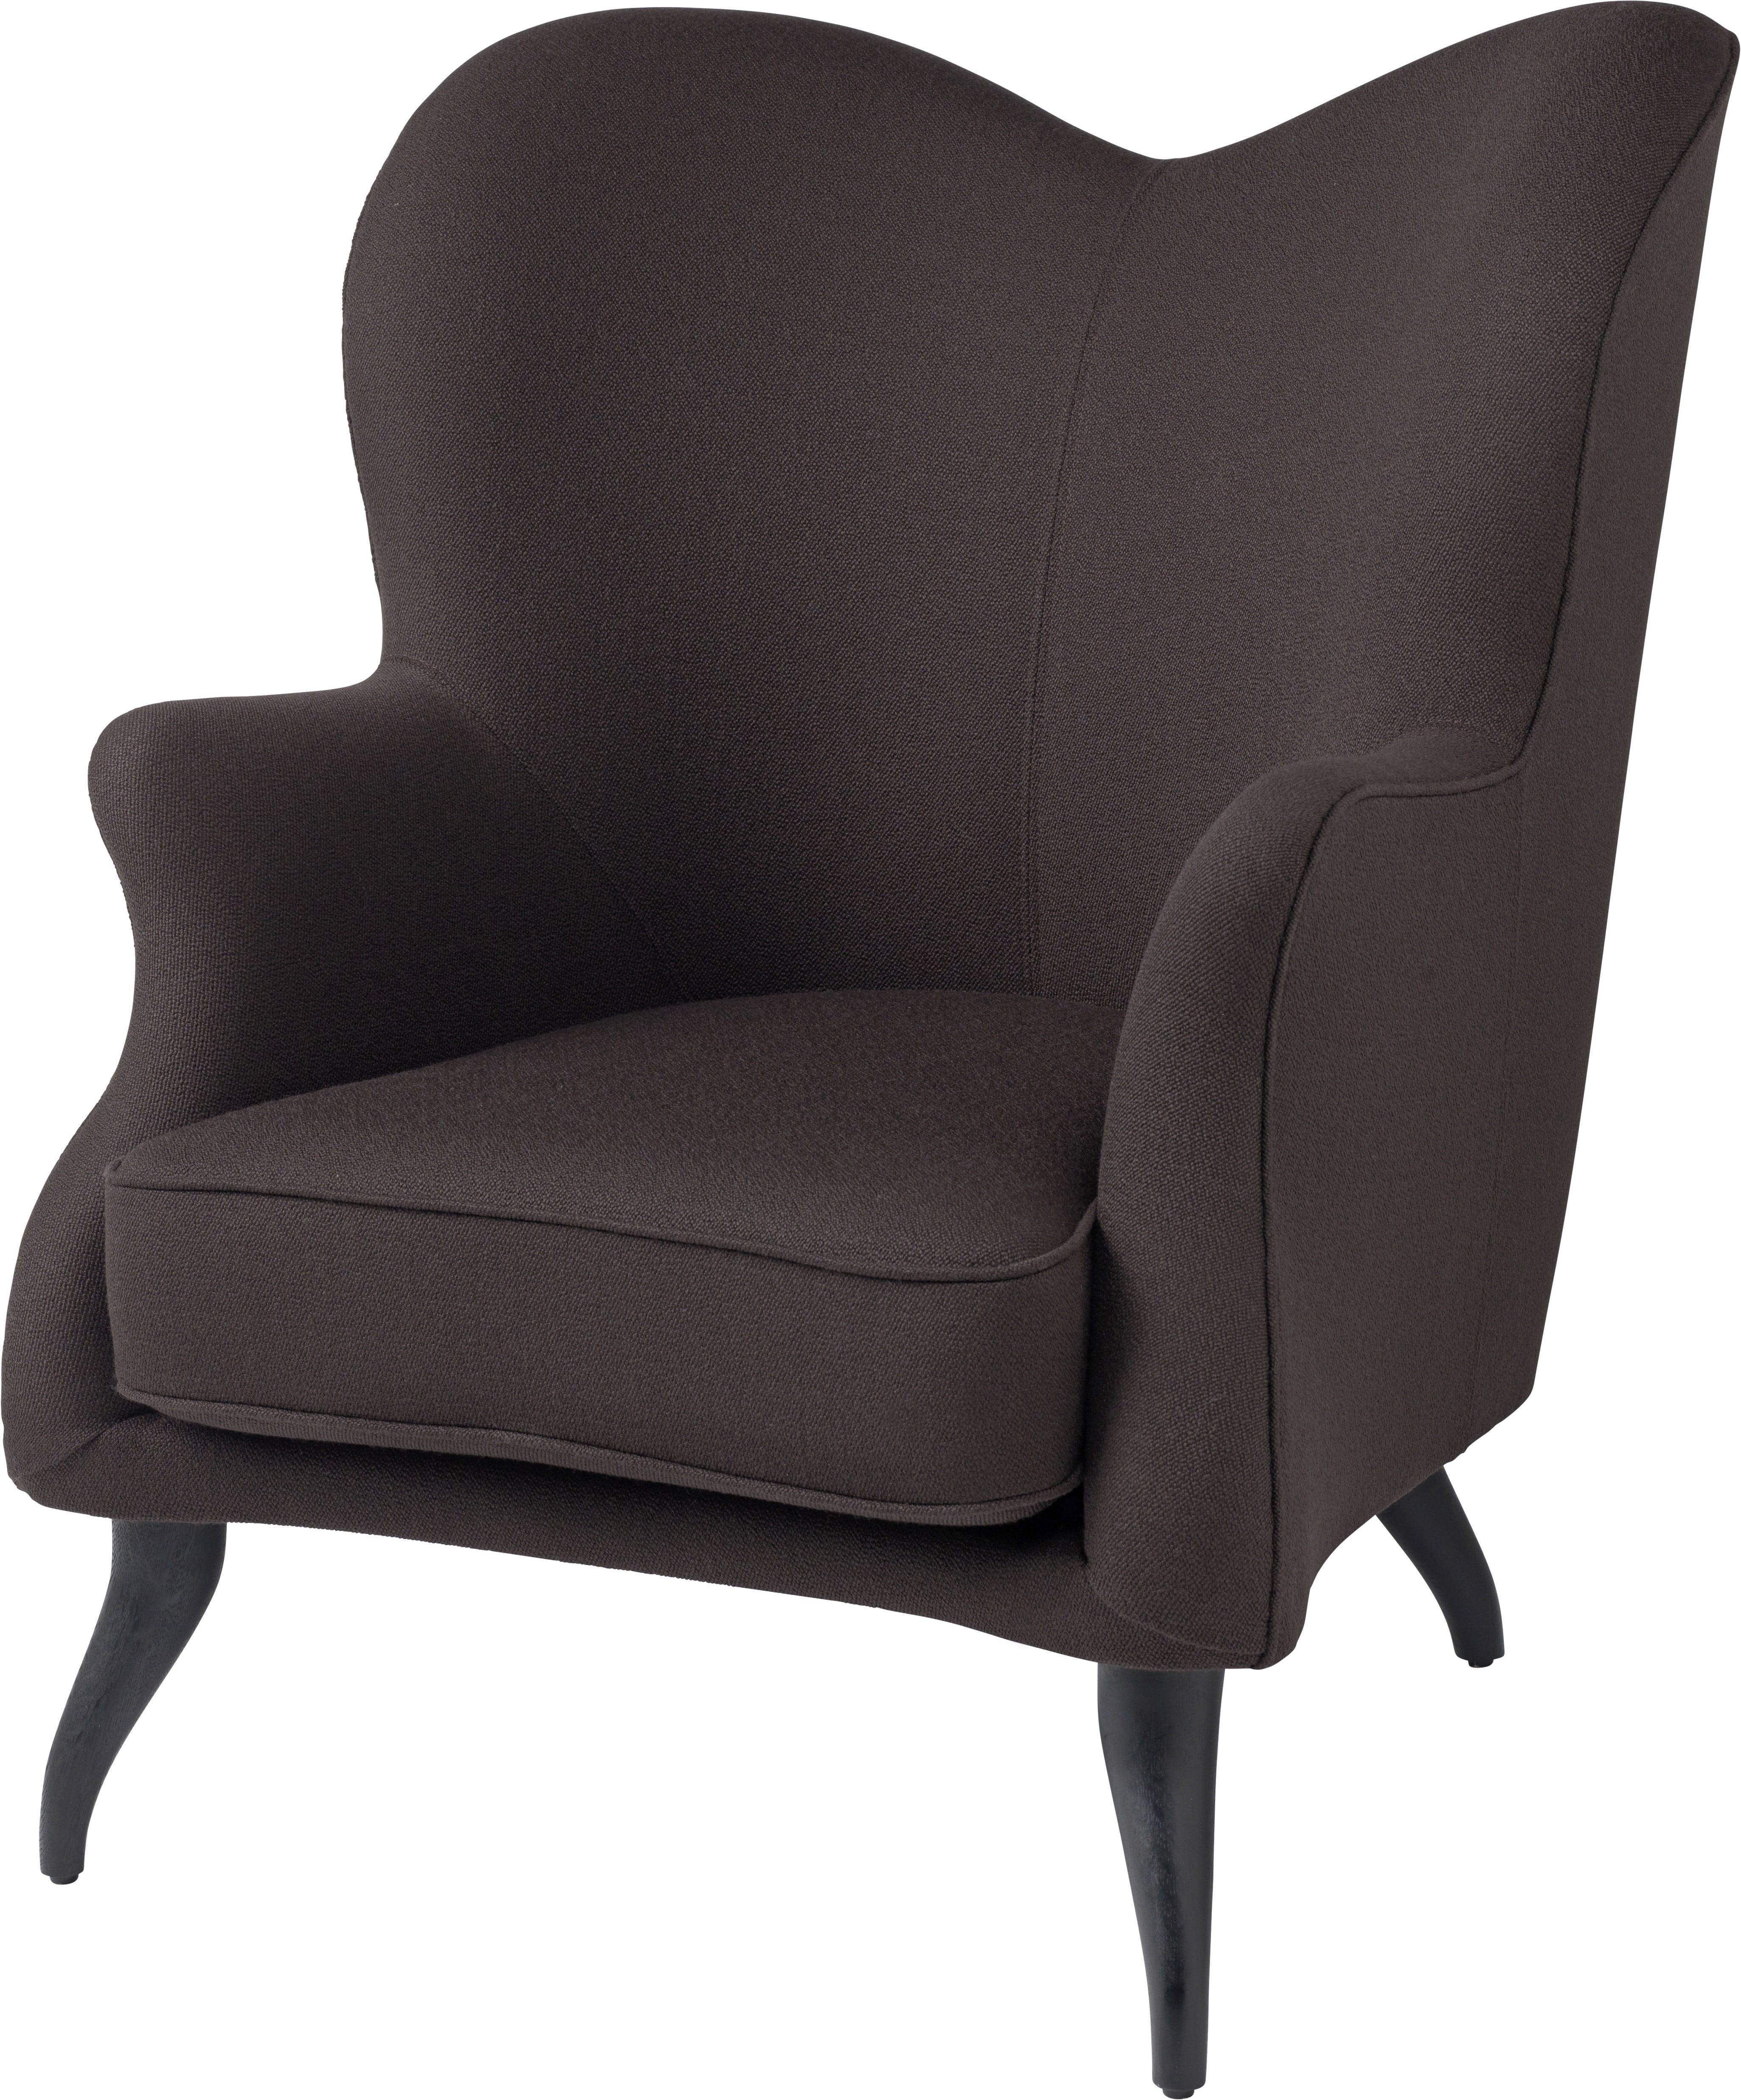 Gubi Bonaparte Lounge Black Angle Haute Living